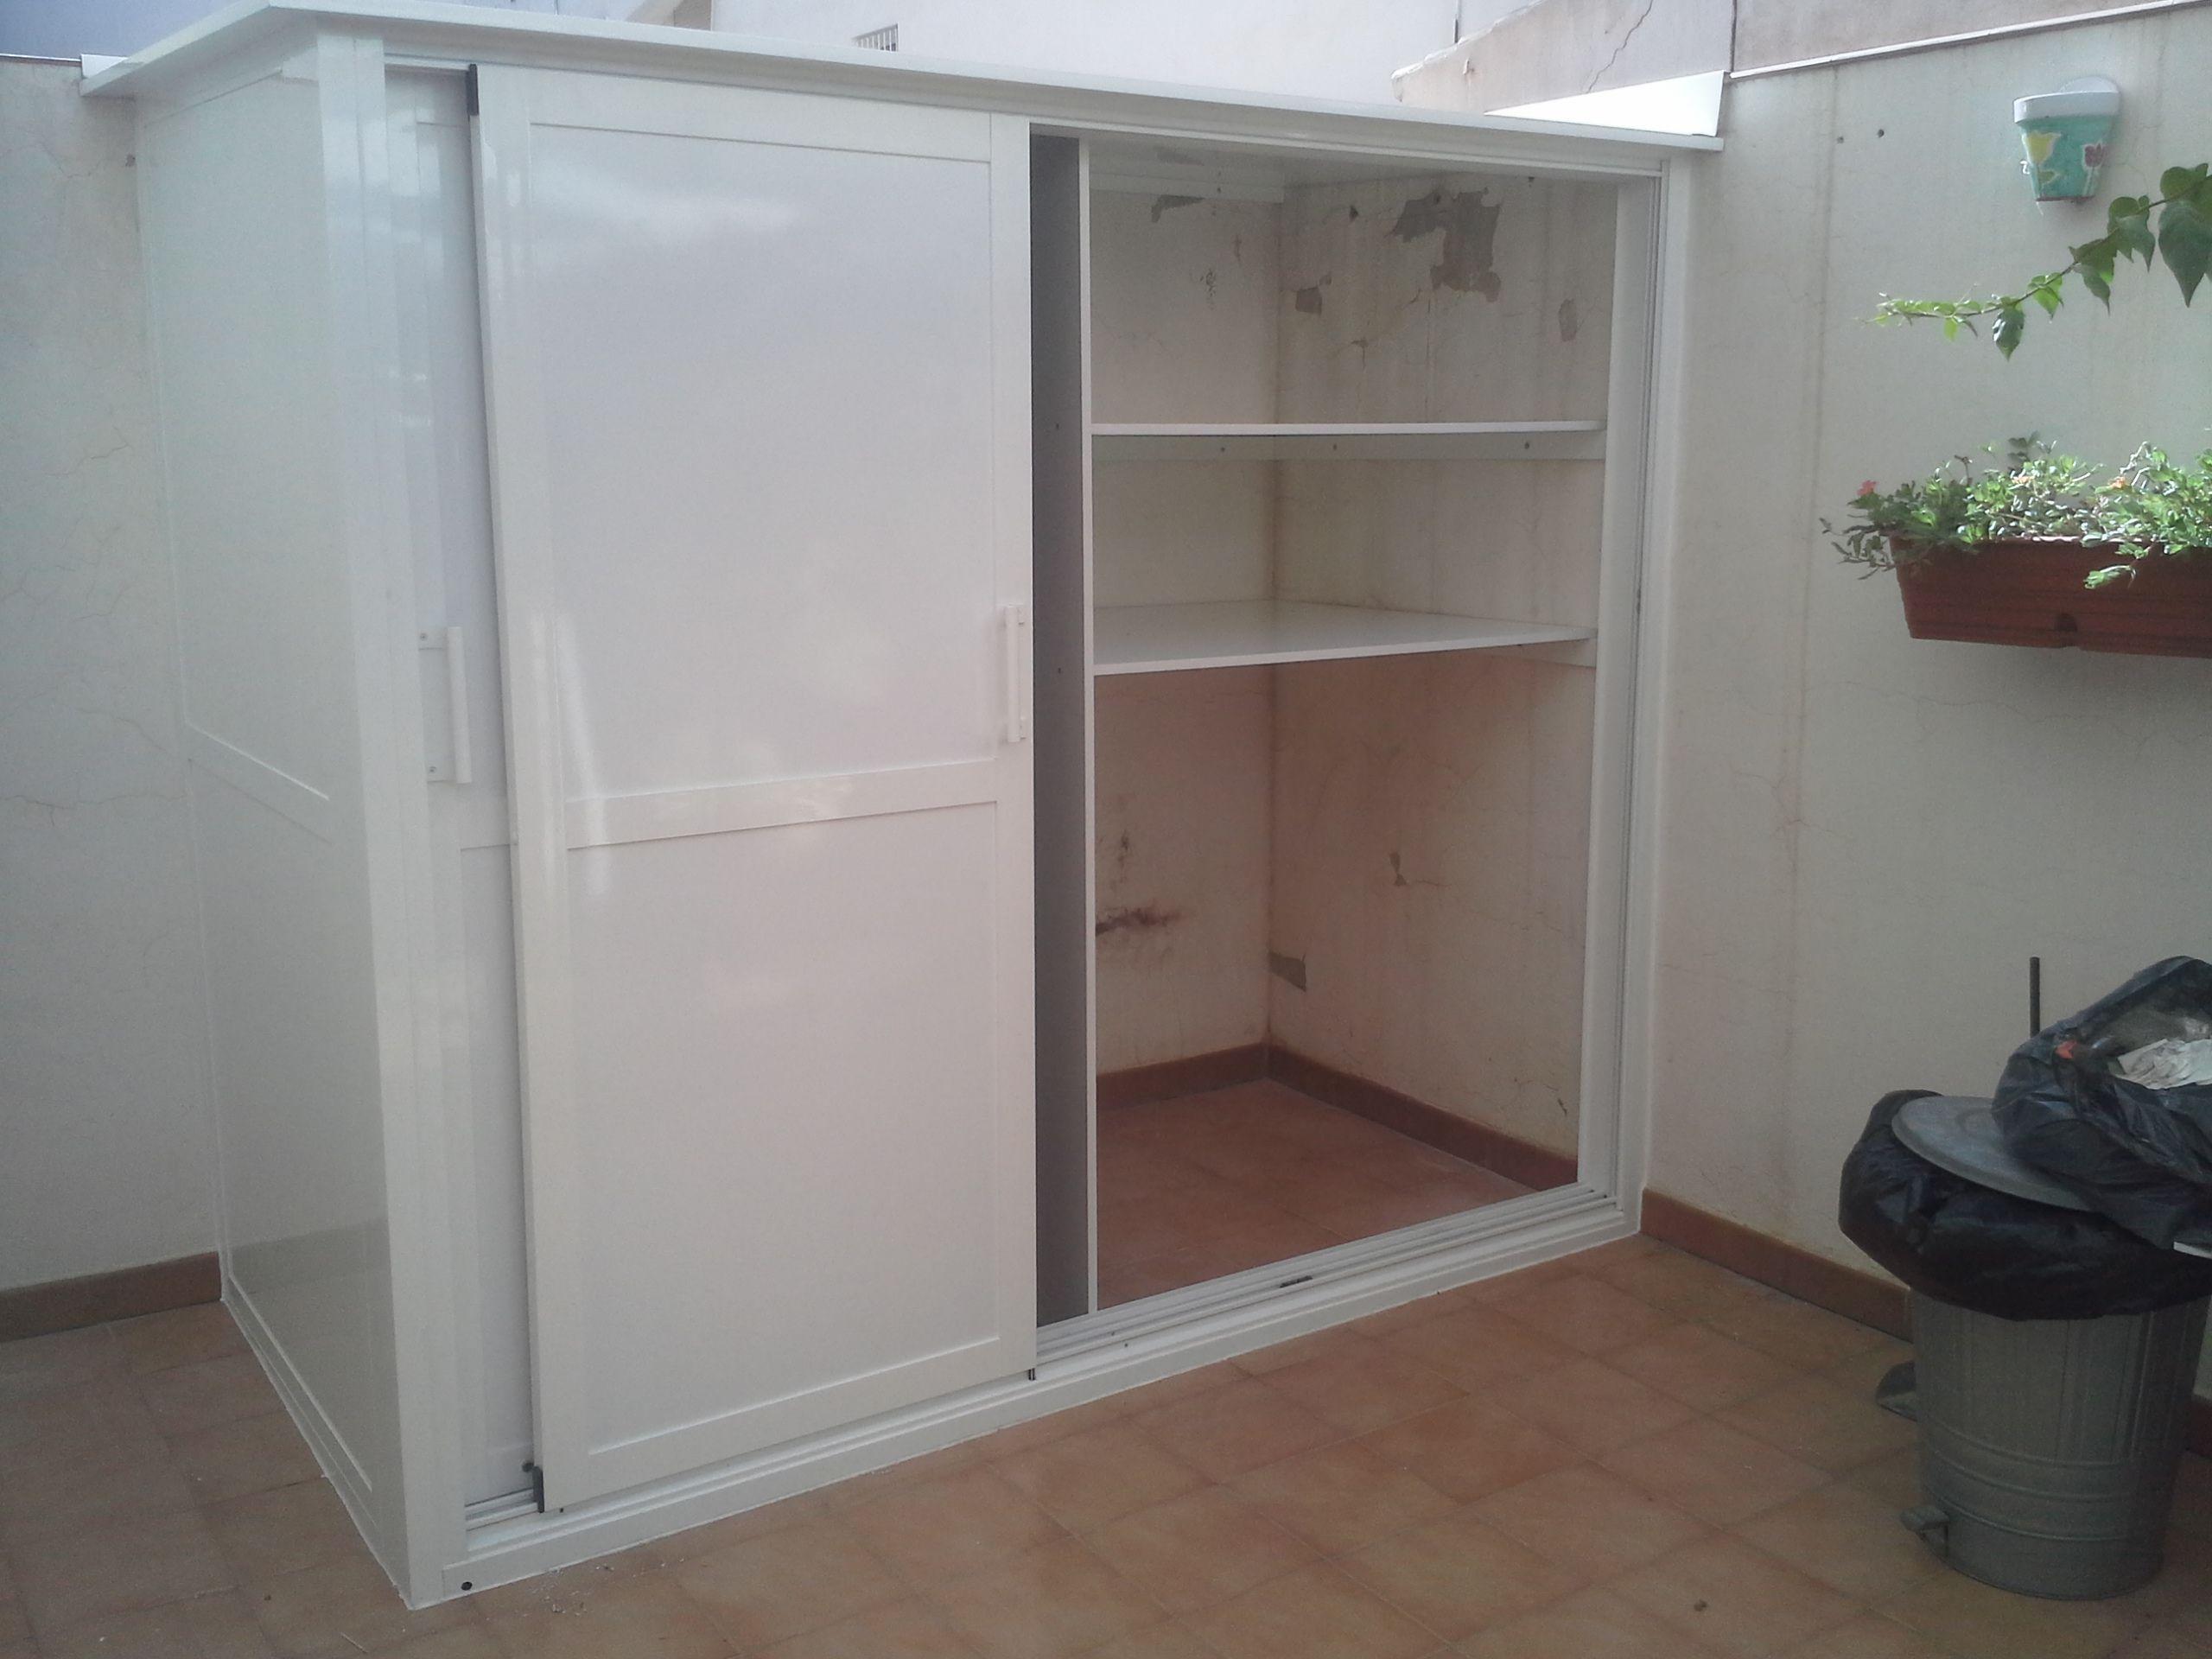 Pin de teresa cristina en armario pinterest lavaderos for Lavadero metalico